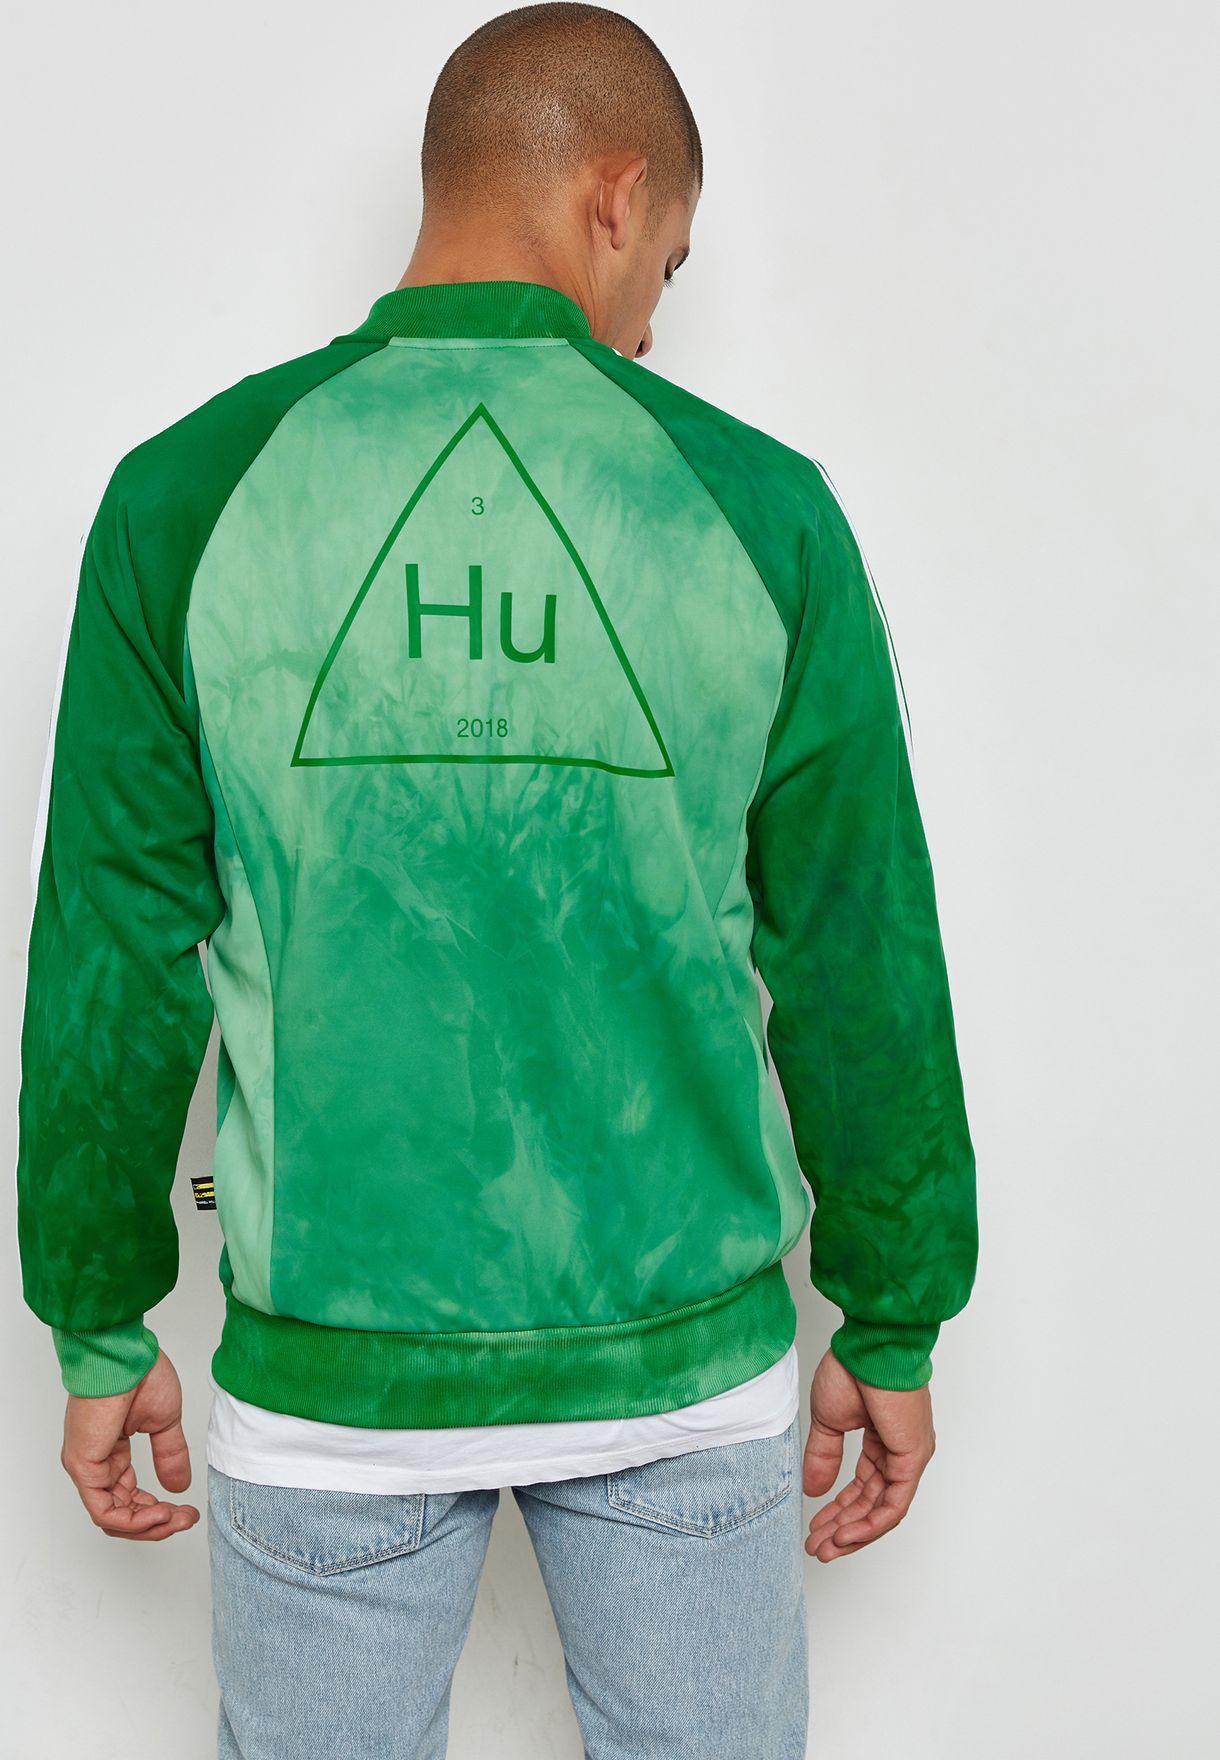 most popular 50% off crazy price Pharrell Williams Hu Holi Track Jacket